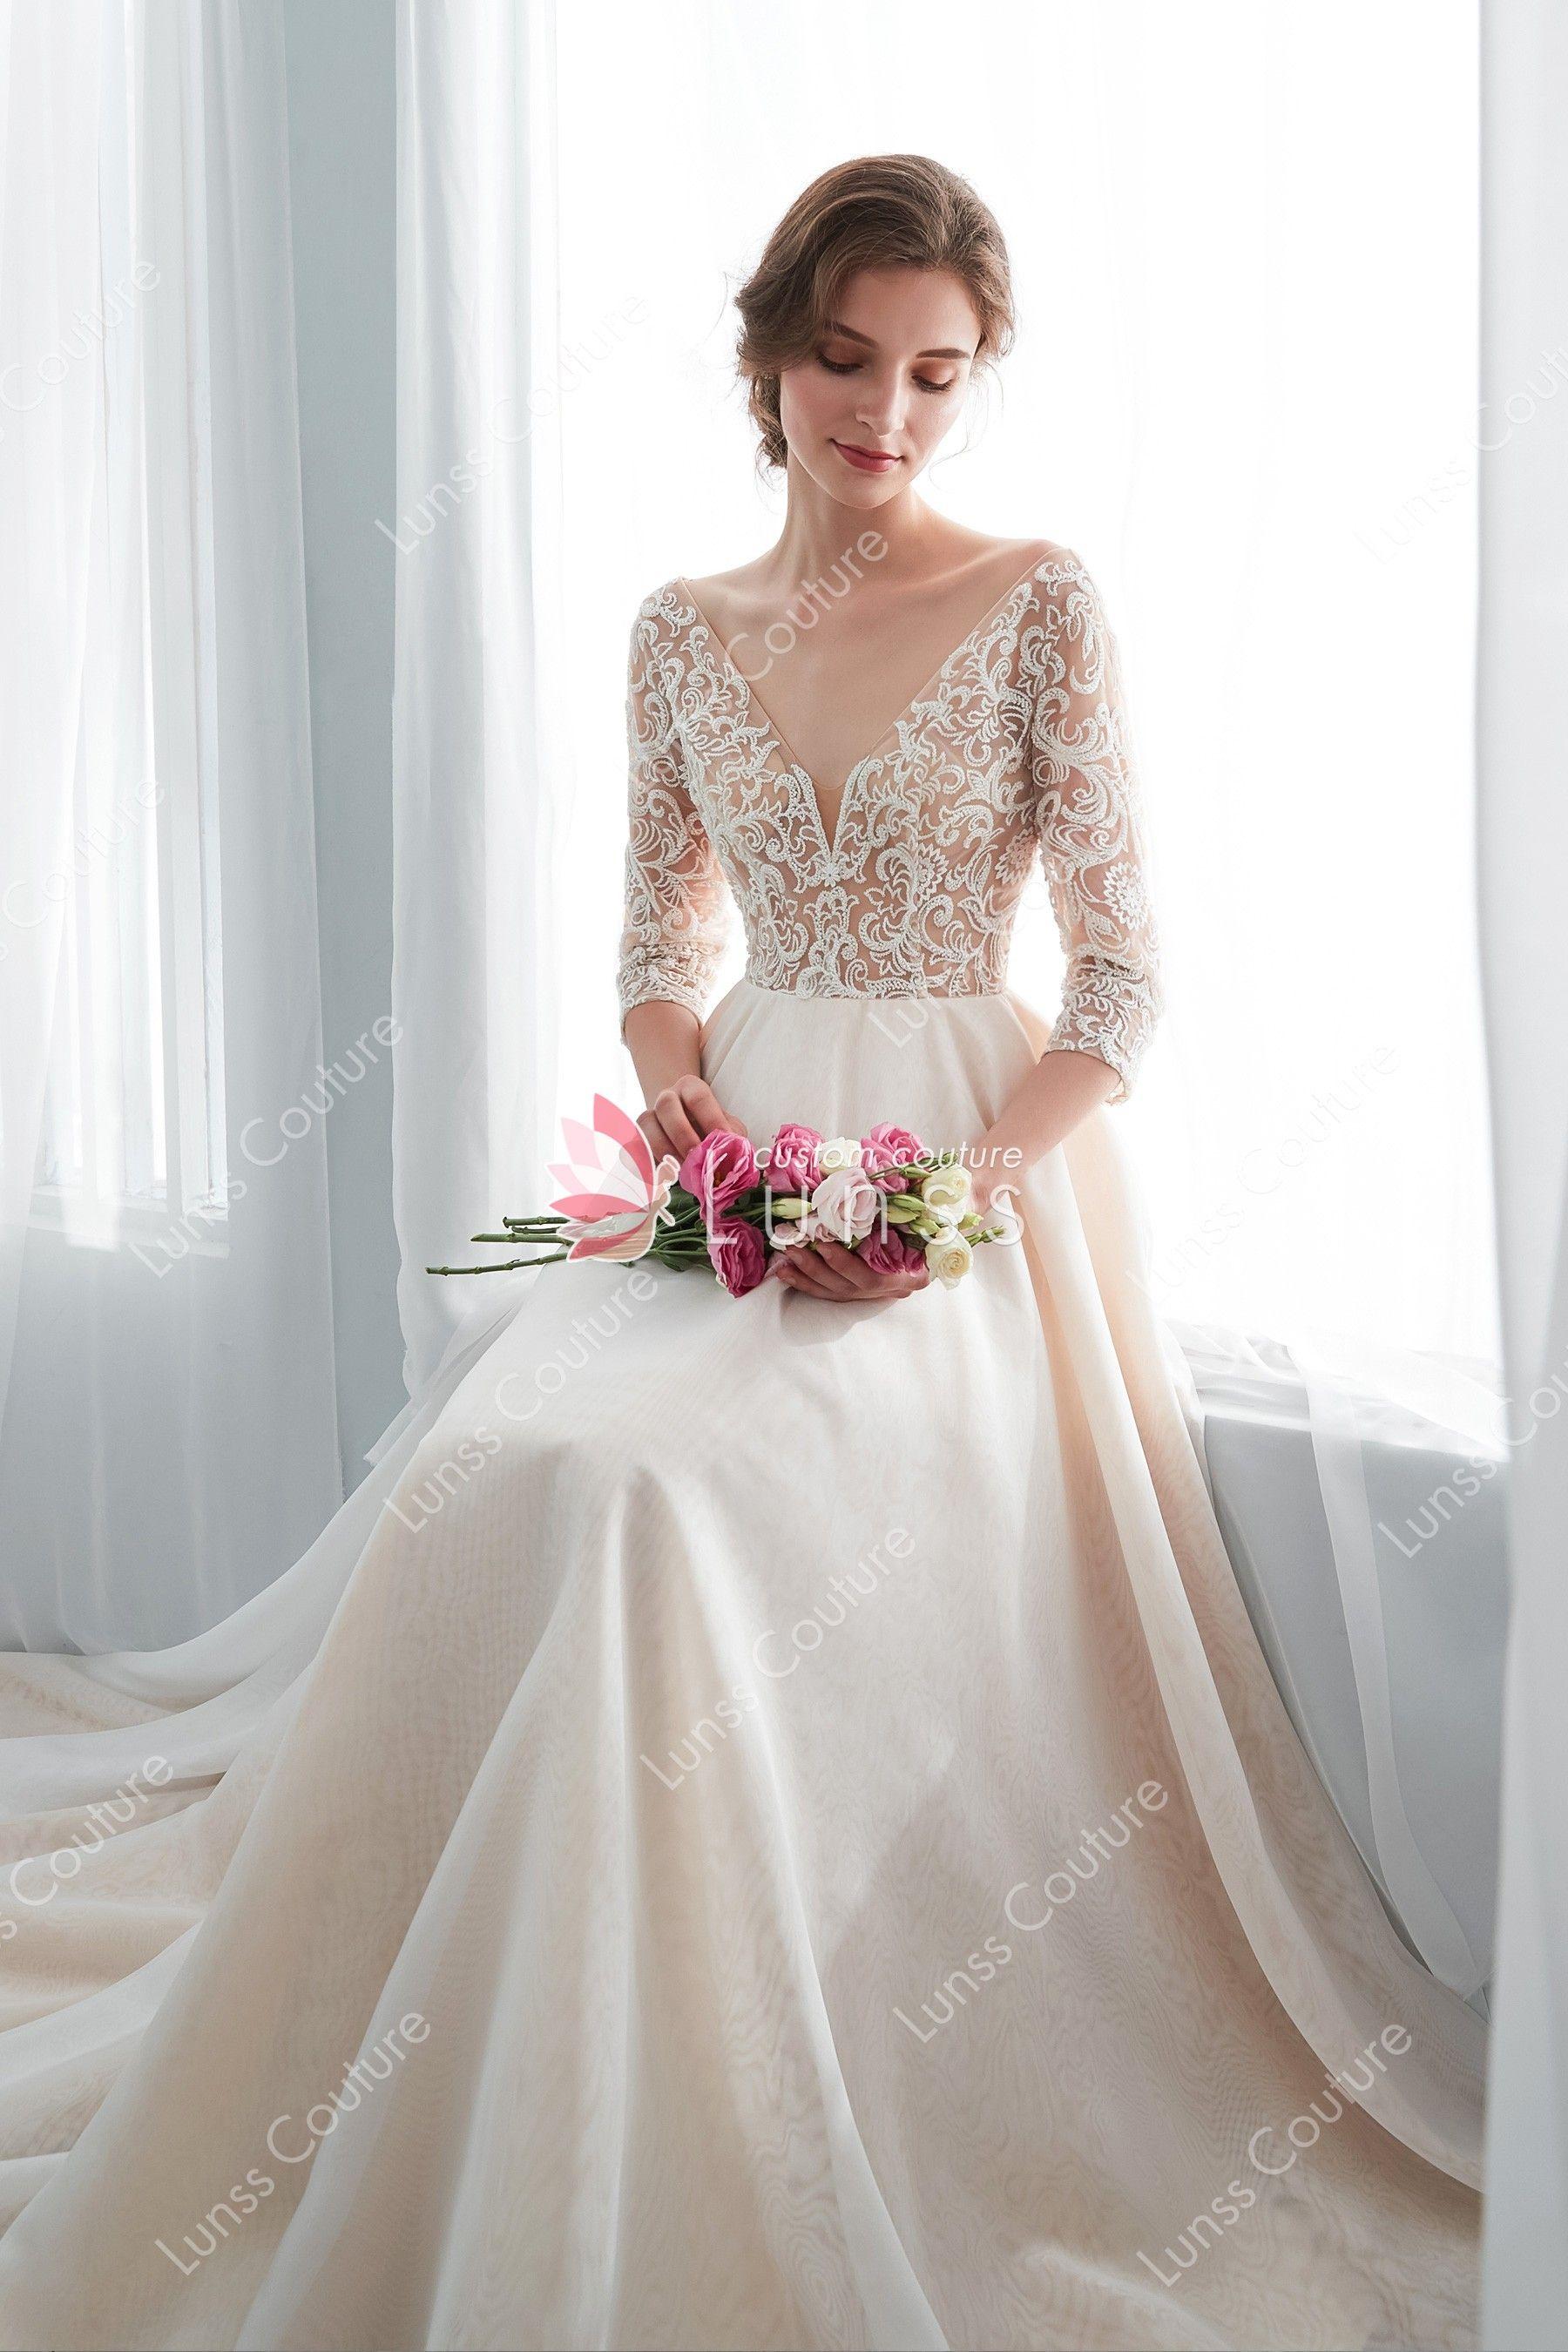 23+ 34 sleeve wedding dress information